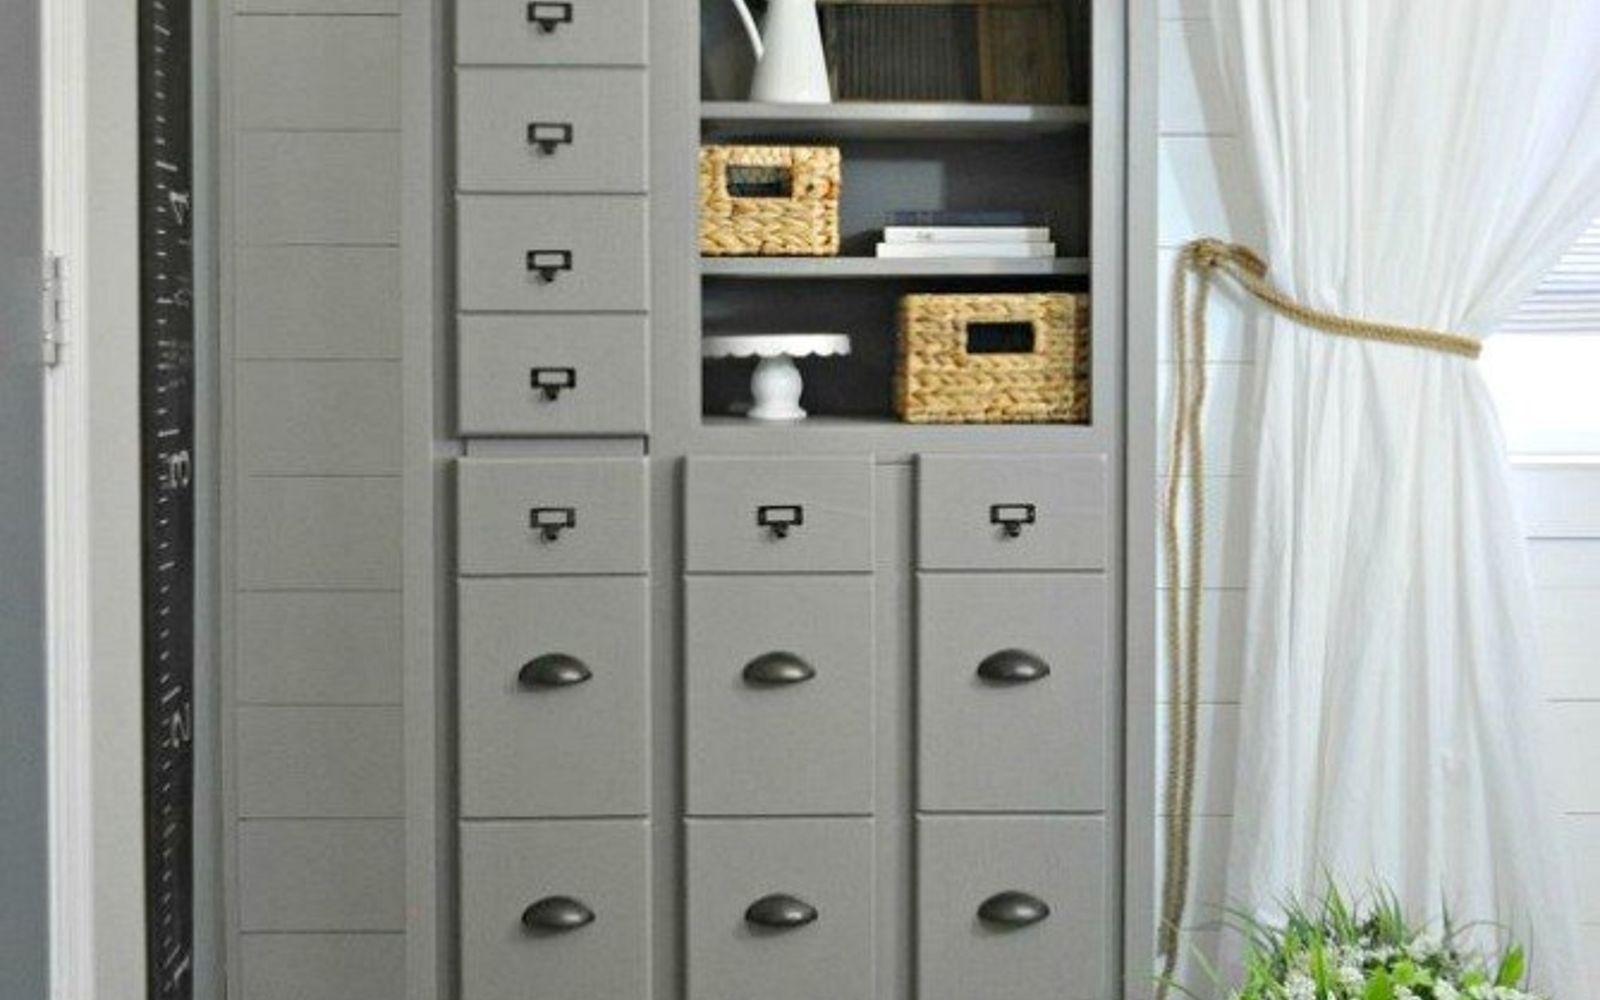 s 9 incredible organizing ideas we wish we d seen sooner, organizing, repurposing upcycling, This brilliant dresser repurpose